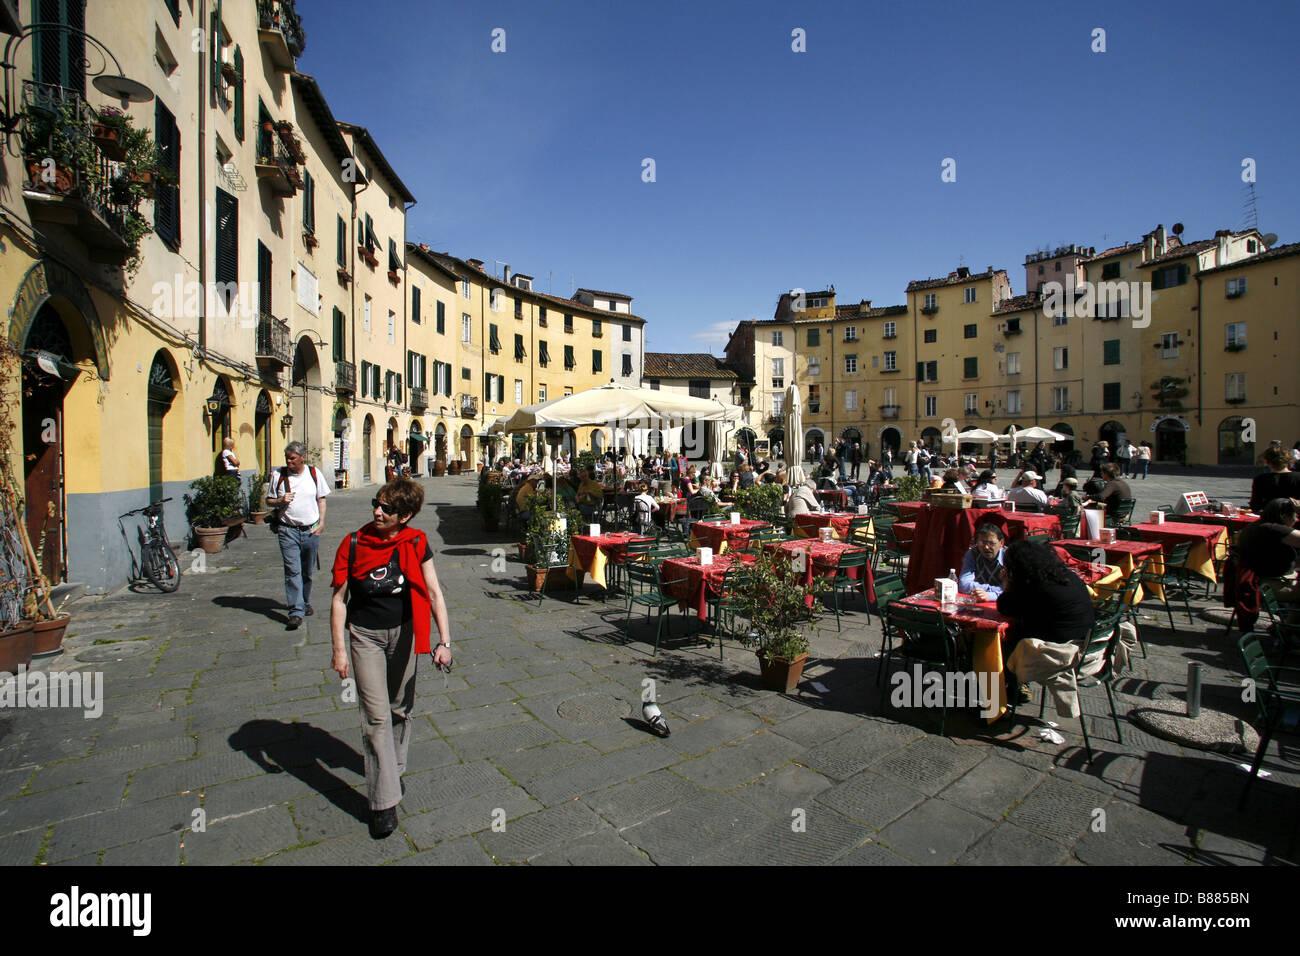 Piazza del Mercato, Lucca, Tuscany, Italy - Stock Image